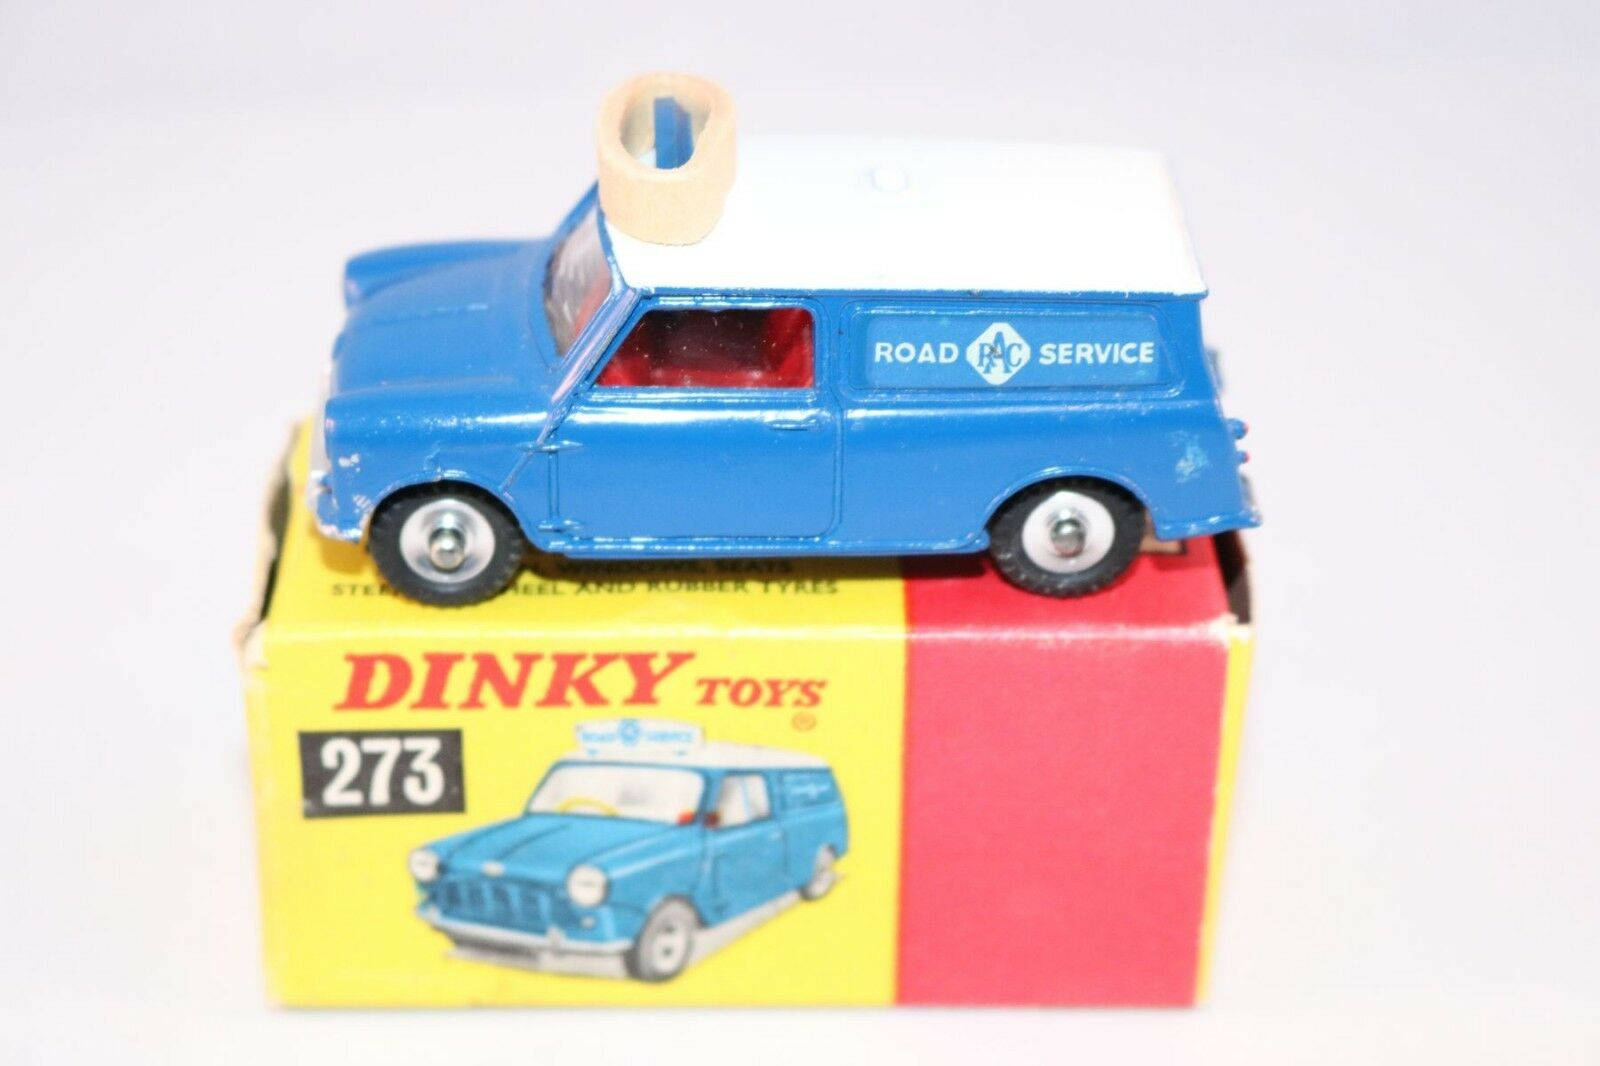 Dinky Toys 273 R.A.C. Patrol Mini  Van very near mint in box  jusqu'à 60% de réduction